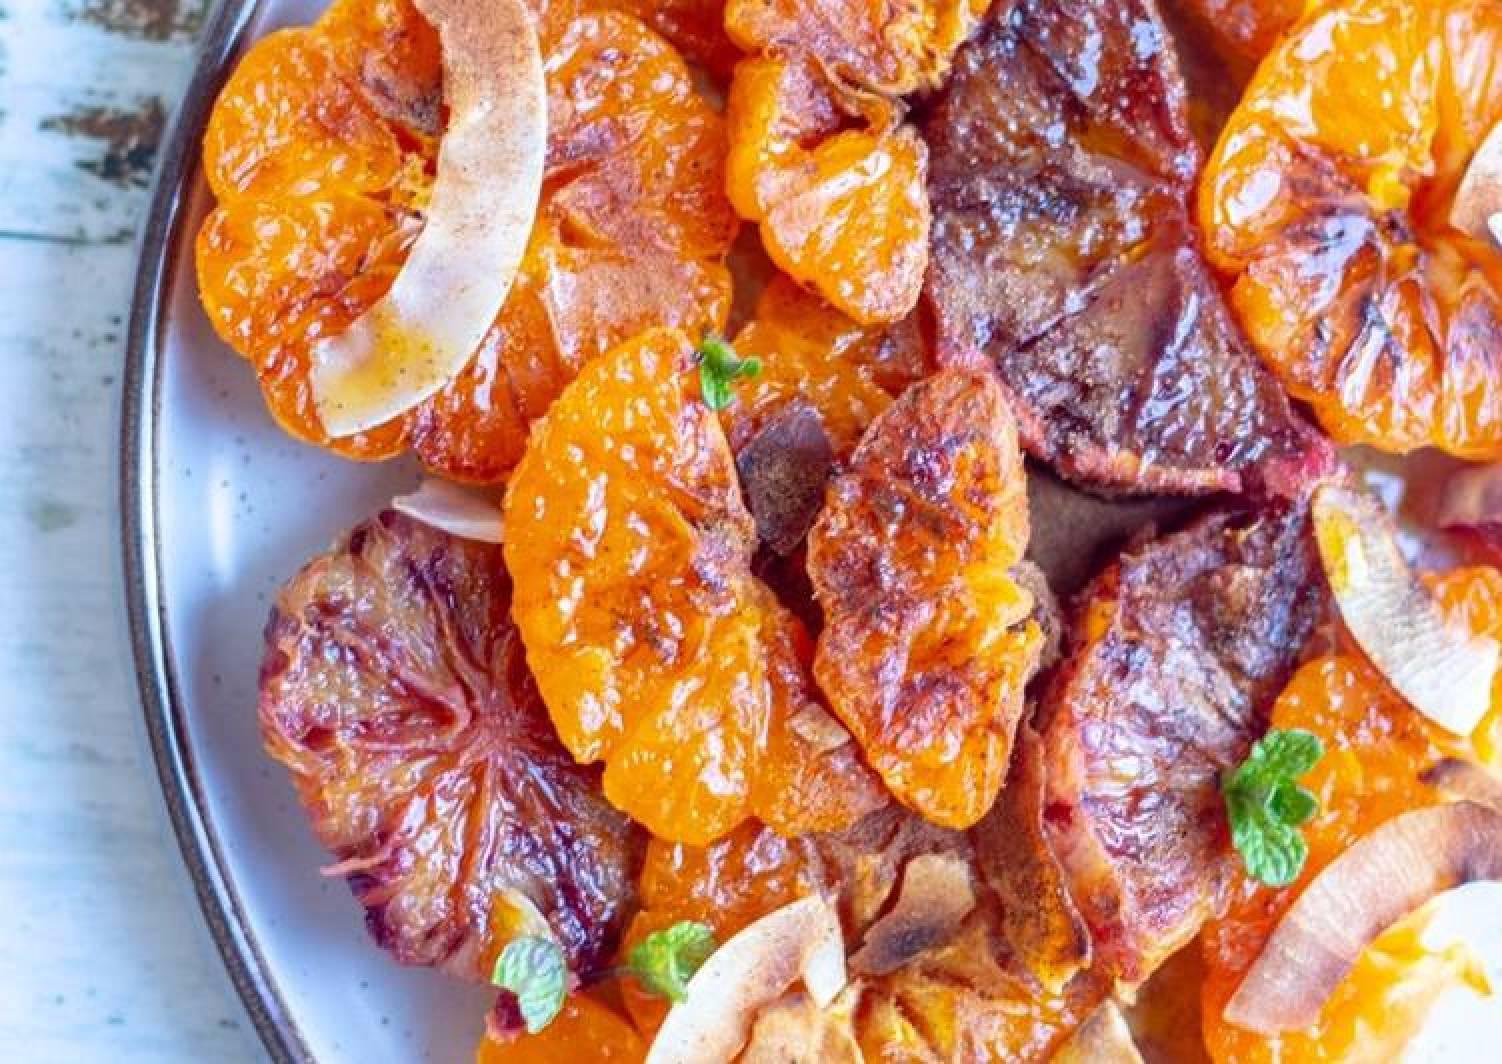 Caramelised oranges